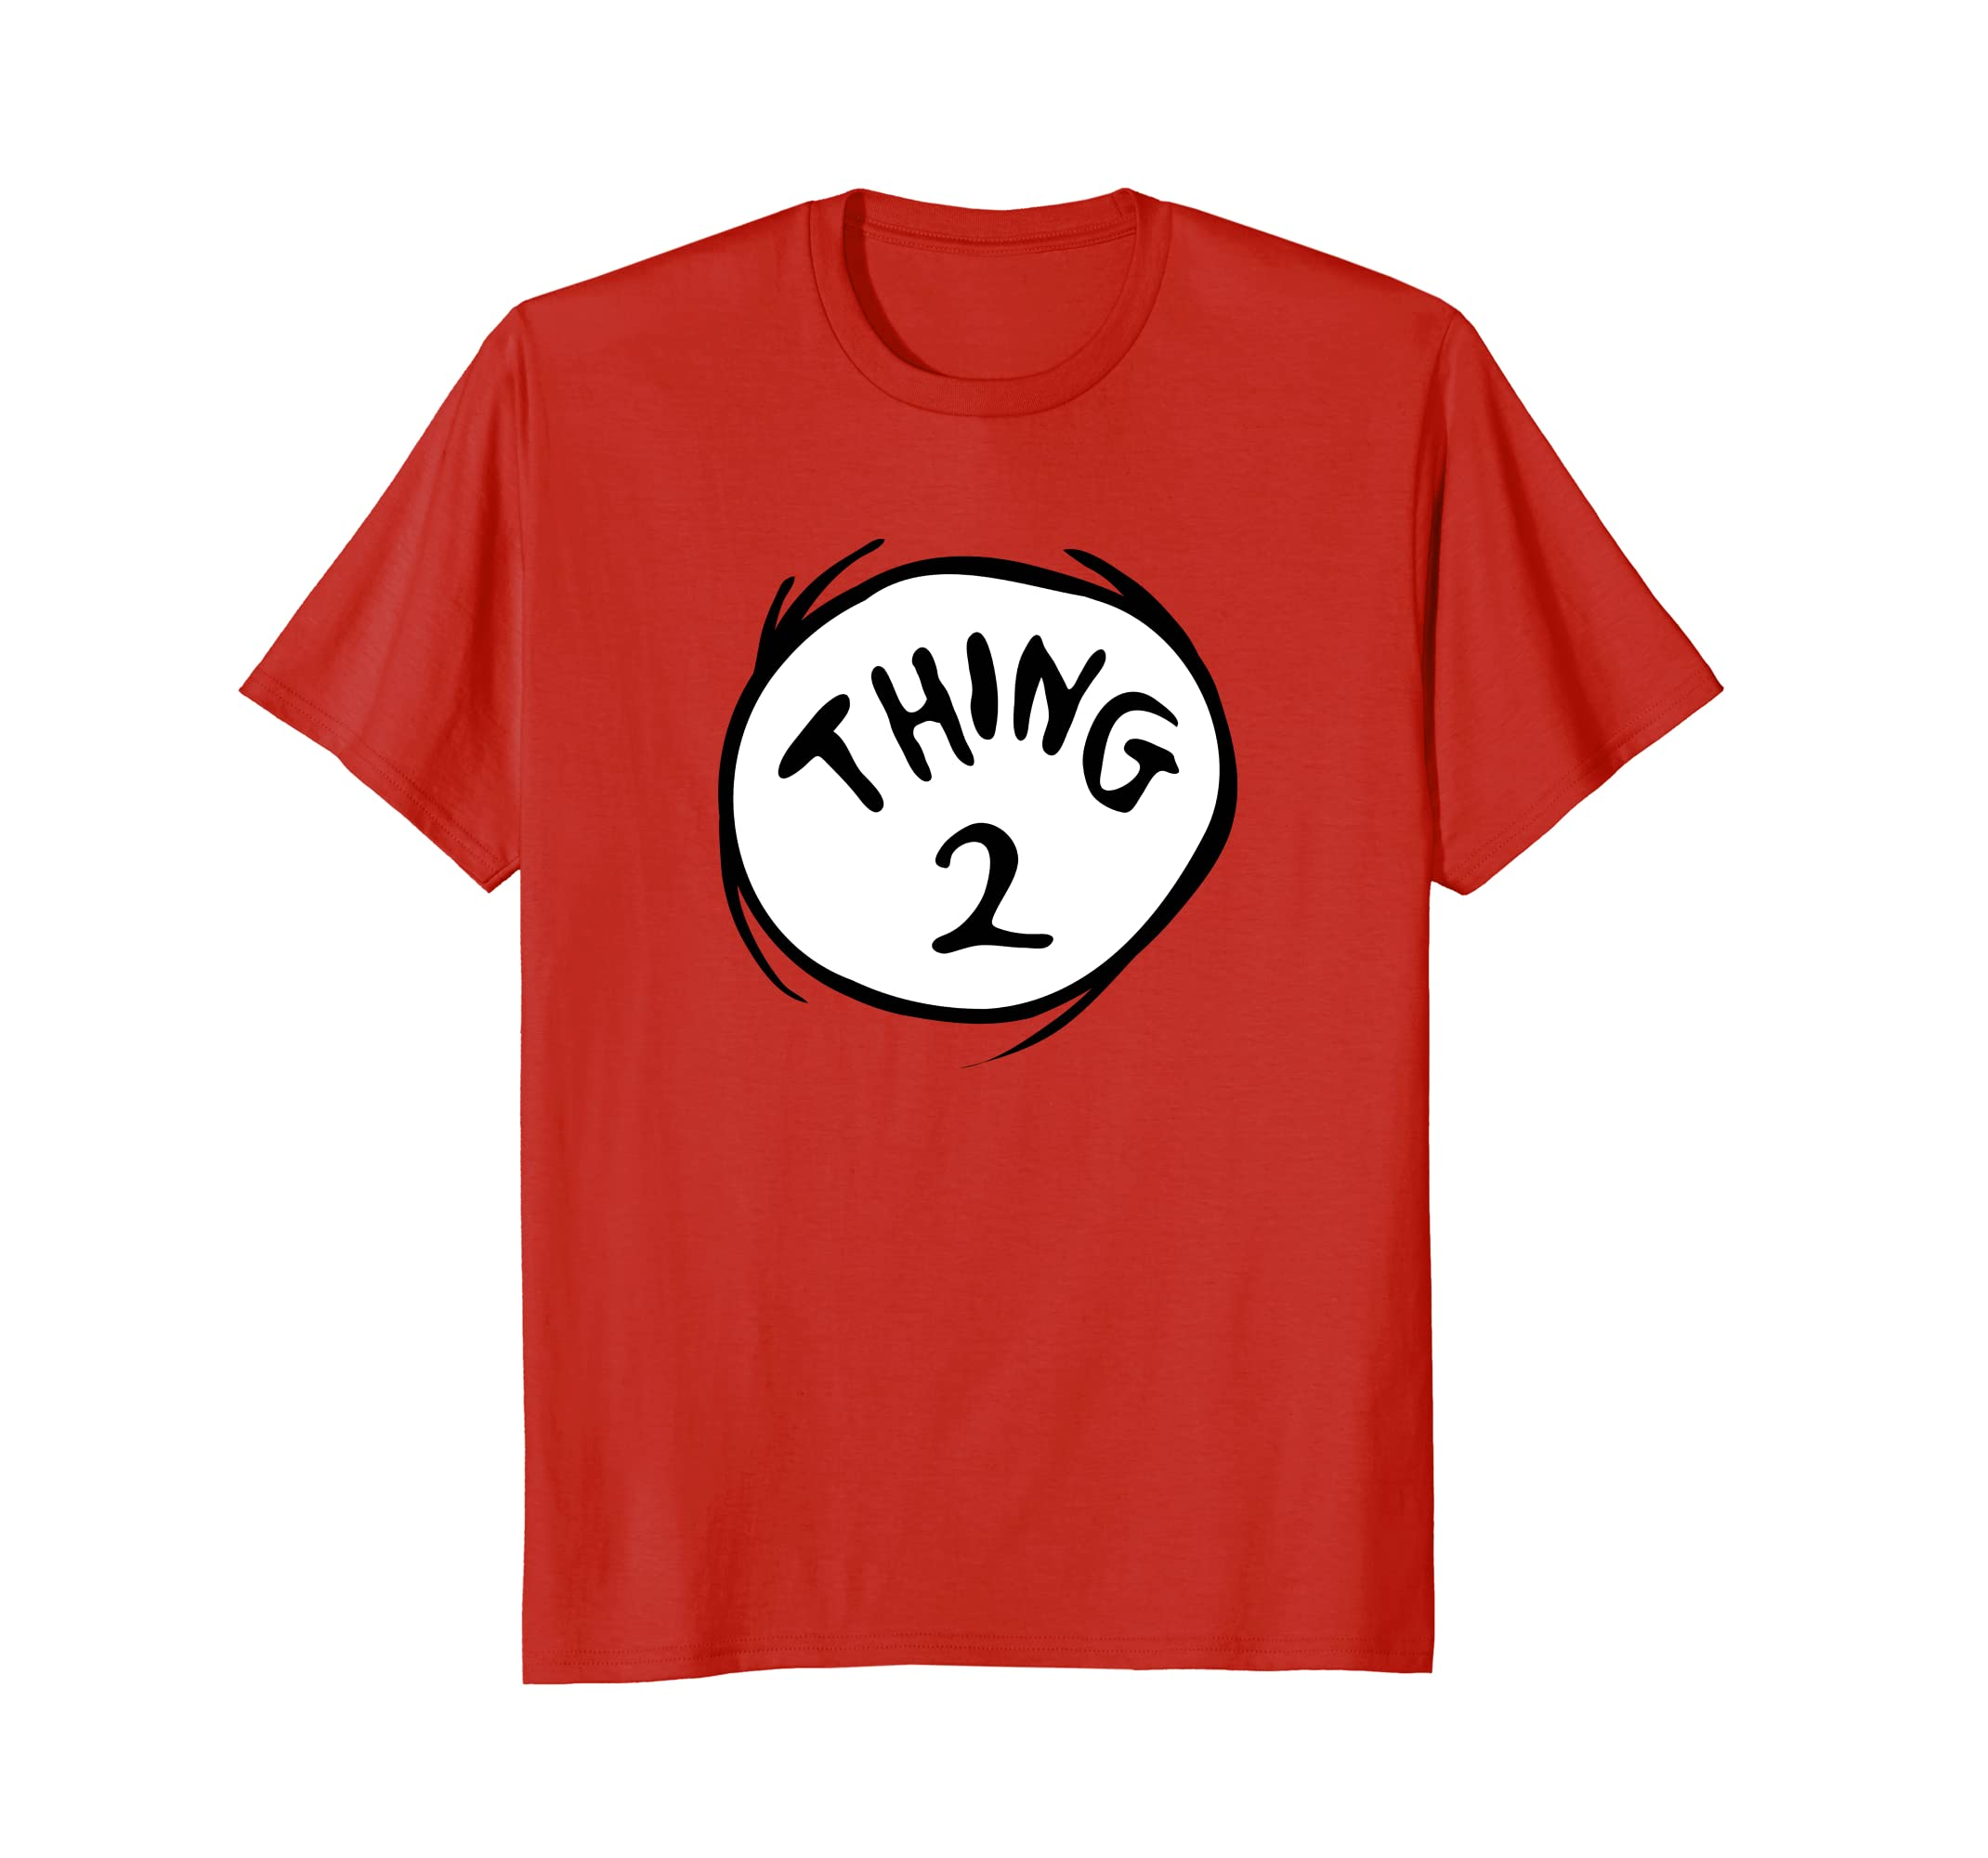 Dr. Seuss Thing 2 Emblem RED T-shirt-ln